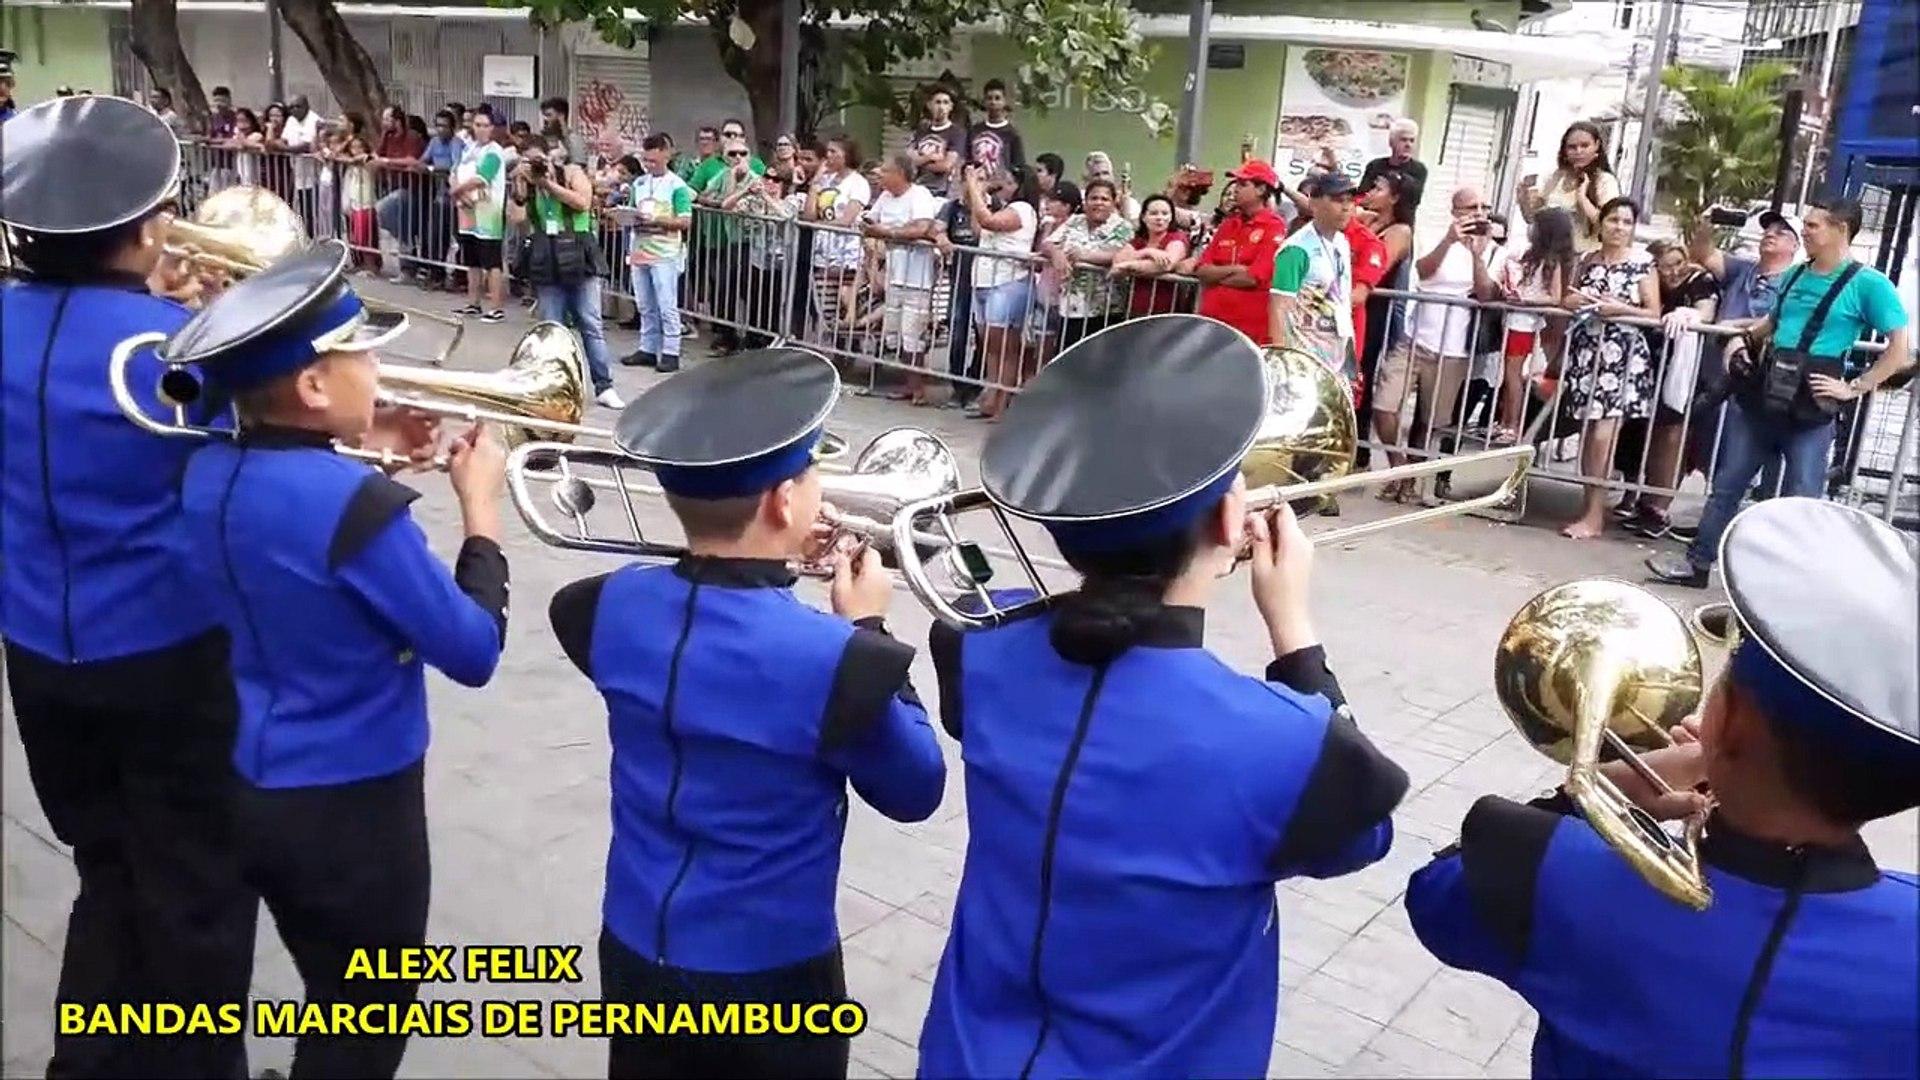 CNBF - 2018 _ Banda Marcial Abdon Ferreira de Carvalho _ CAMPEONATO NACIONAL DE BANDAS E FANFARRAS